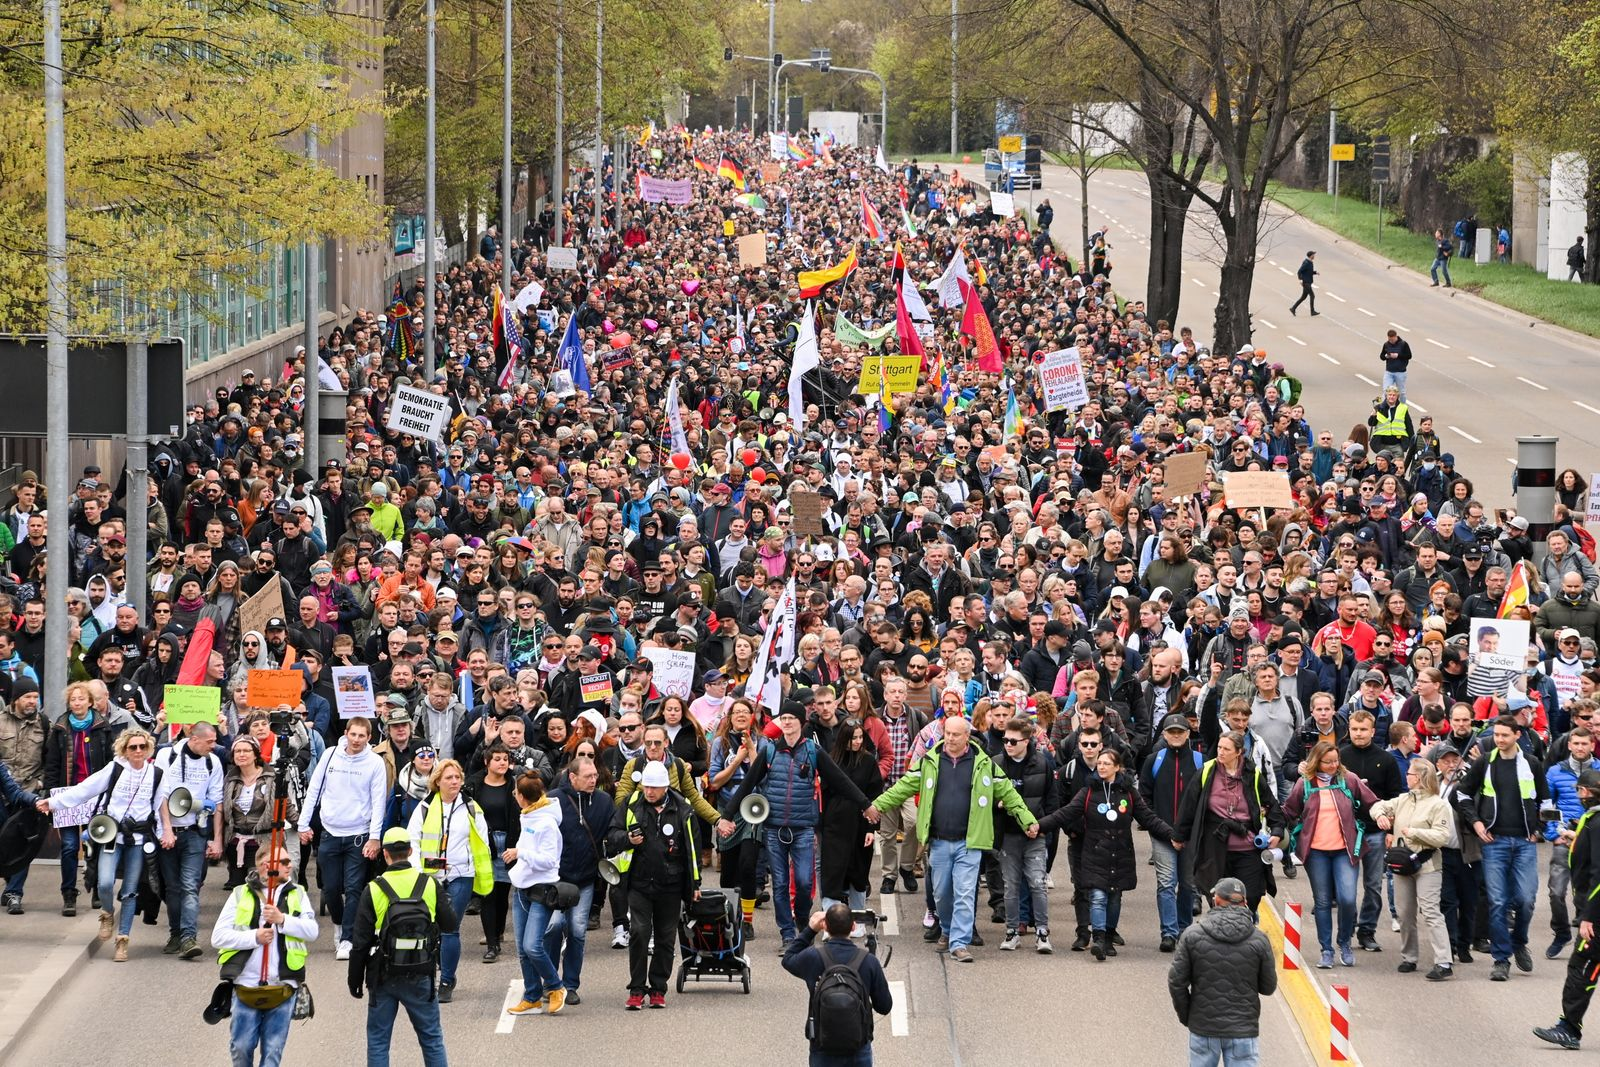 Demonstrations against COVID-19 restrictions in Stuttgart